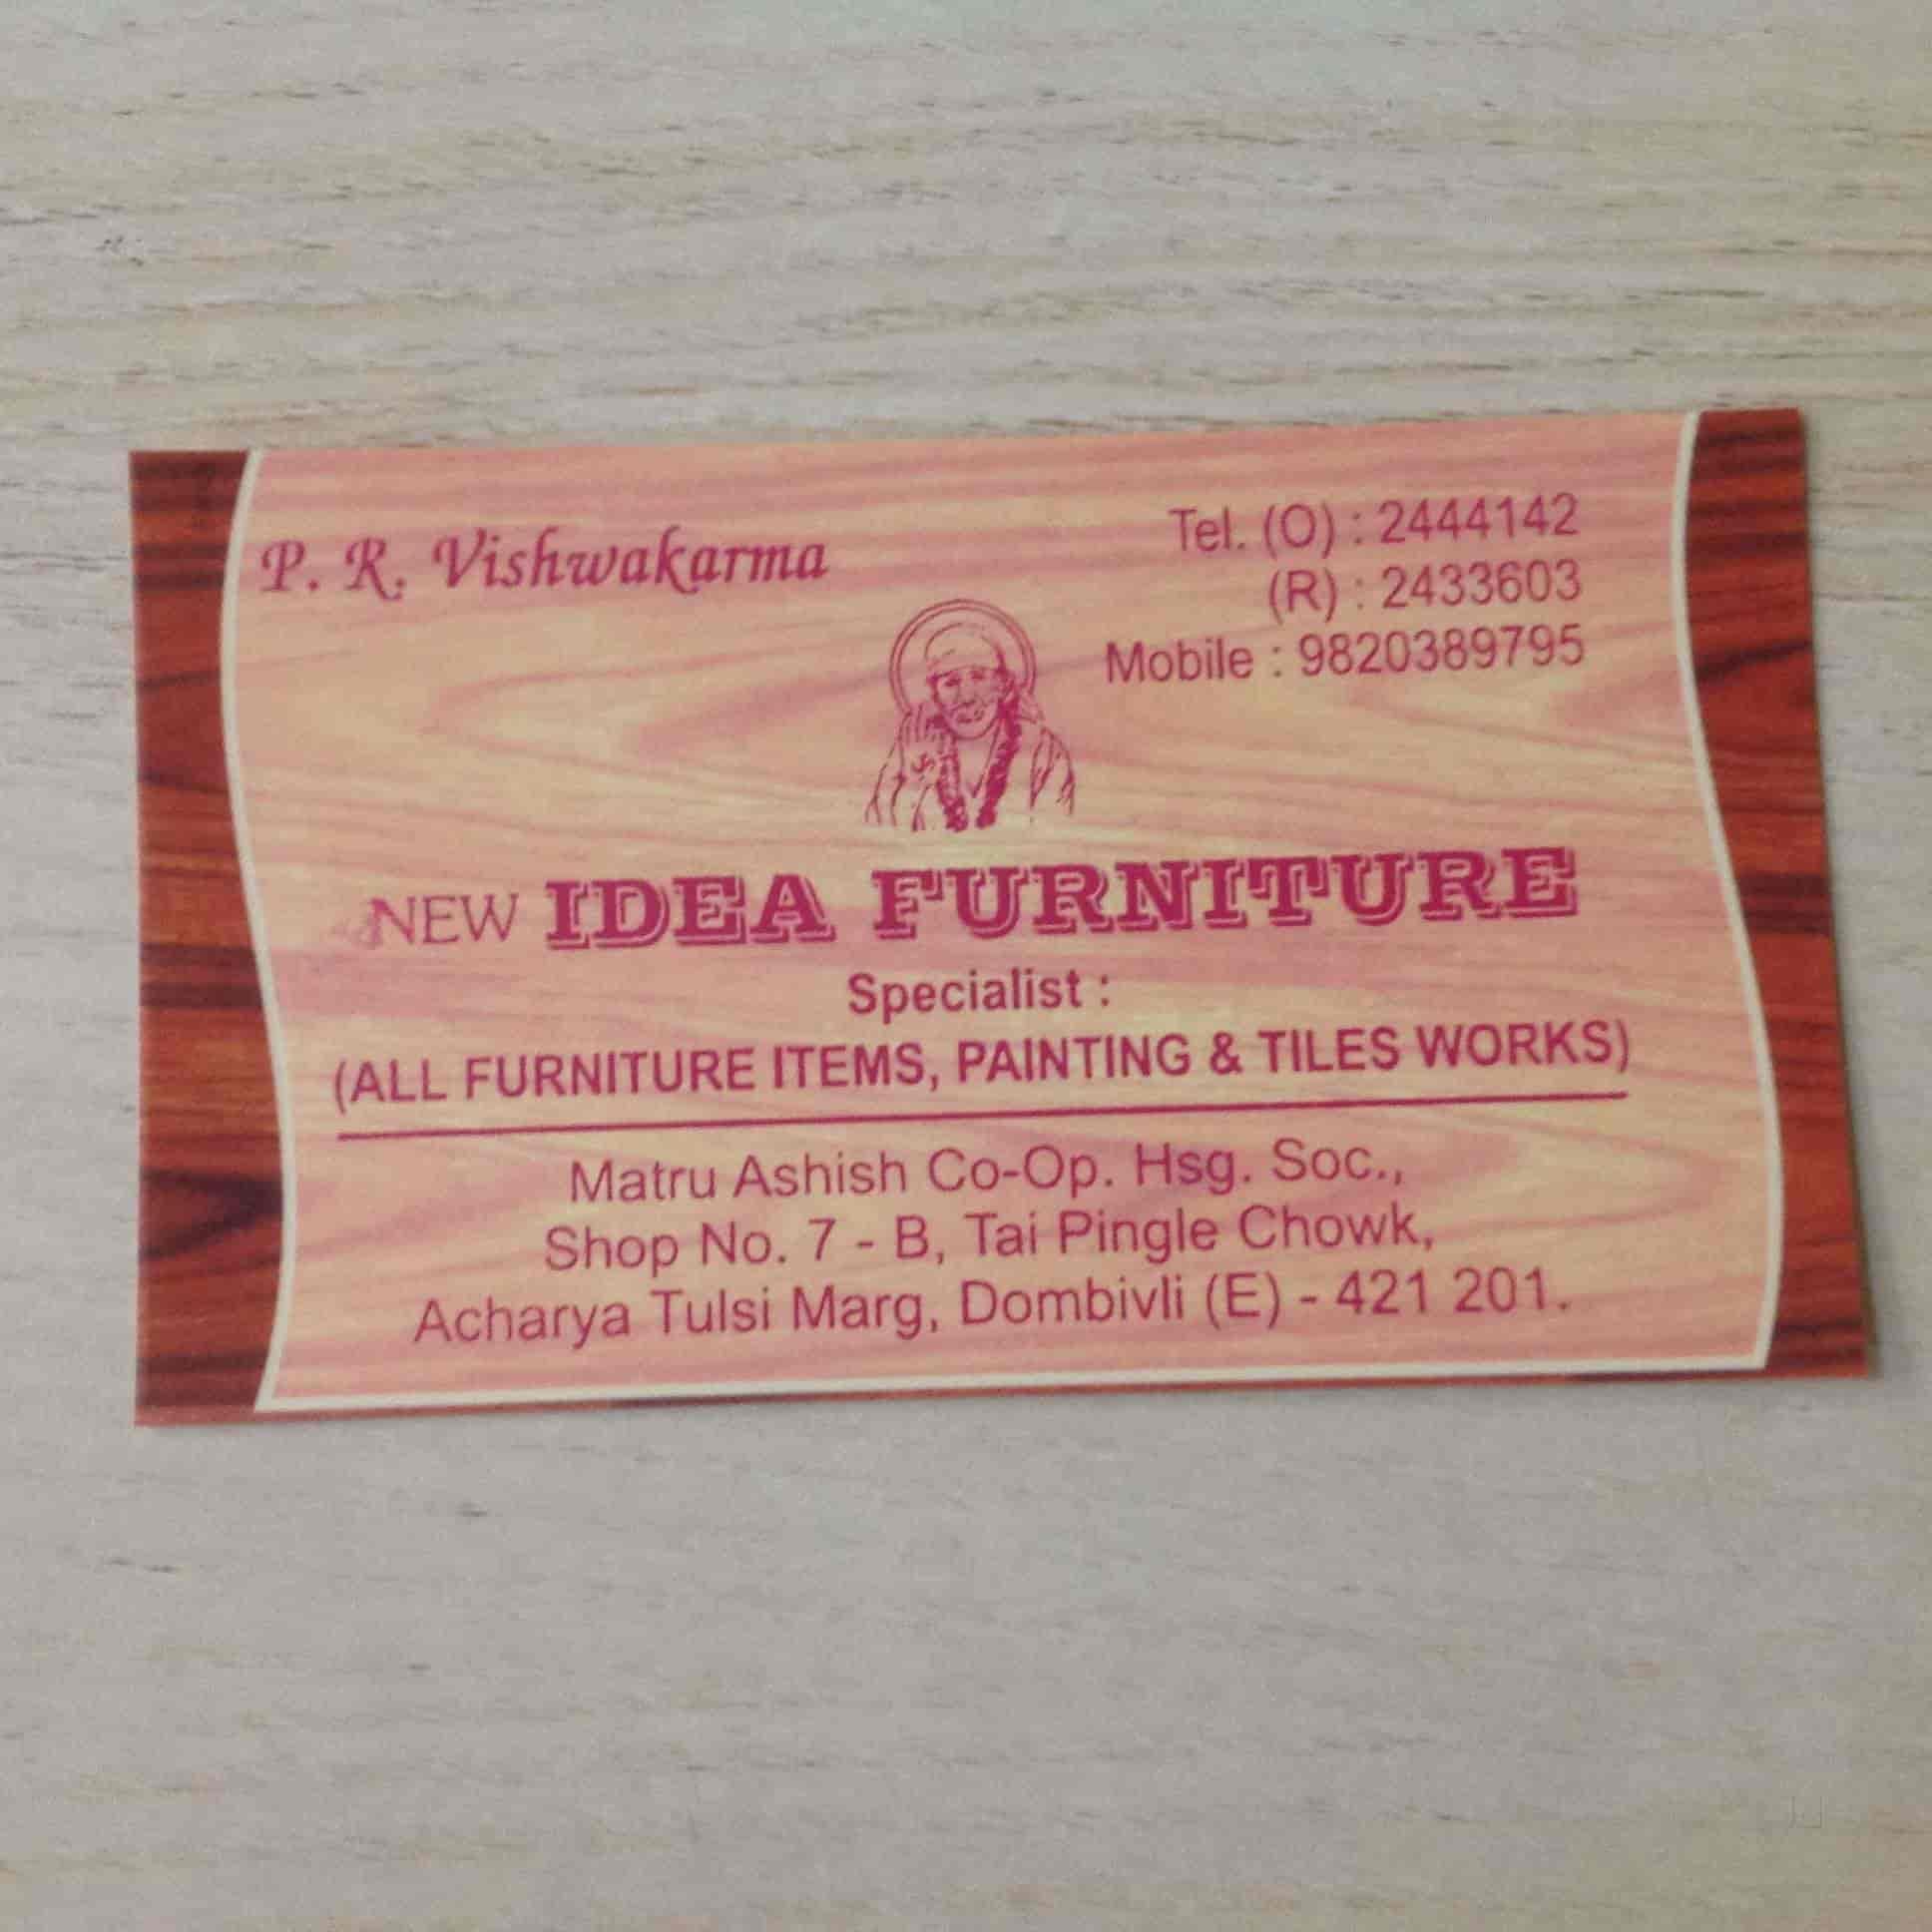 New Idea Furniture, Dombivli East   Furniture Manufacturers In Mumbai    Justdial